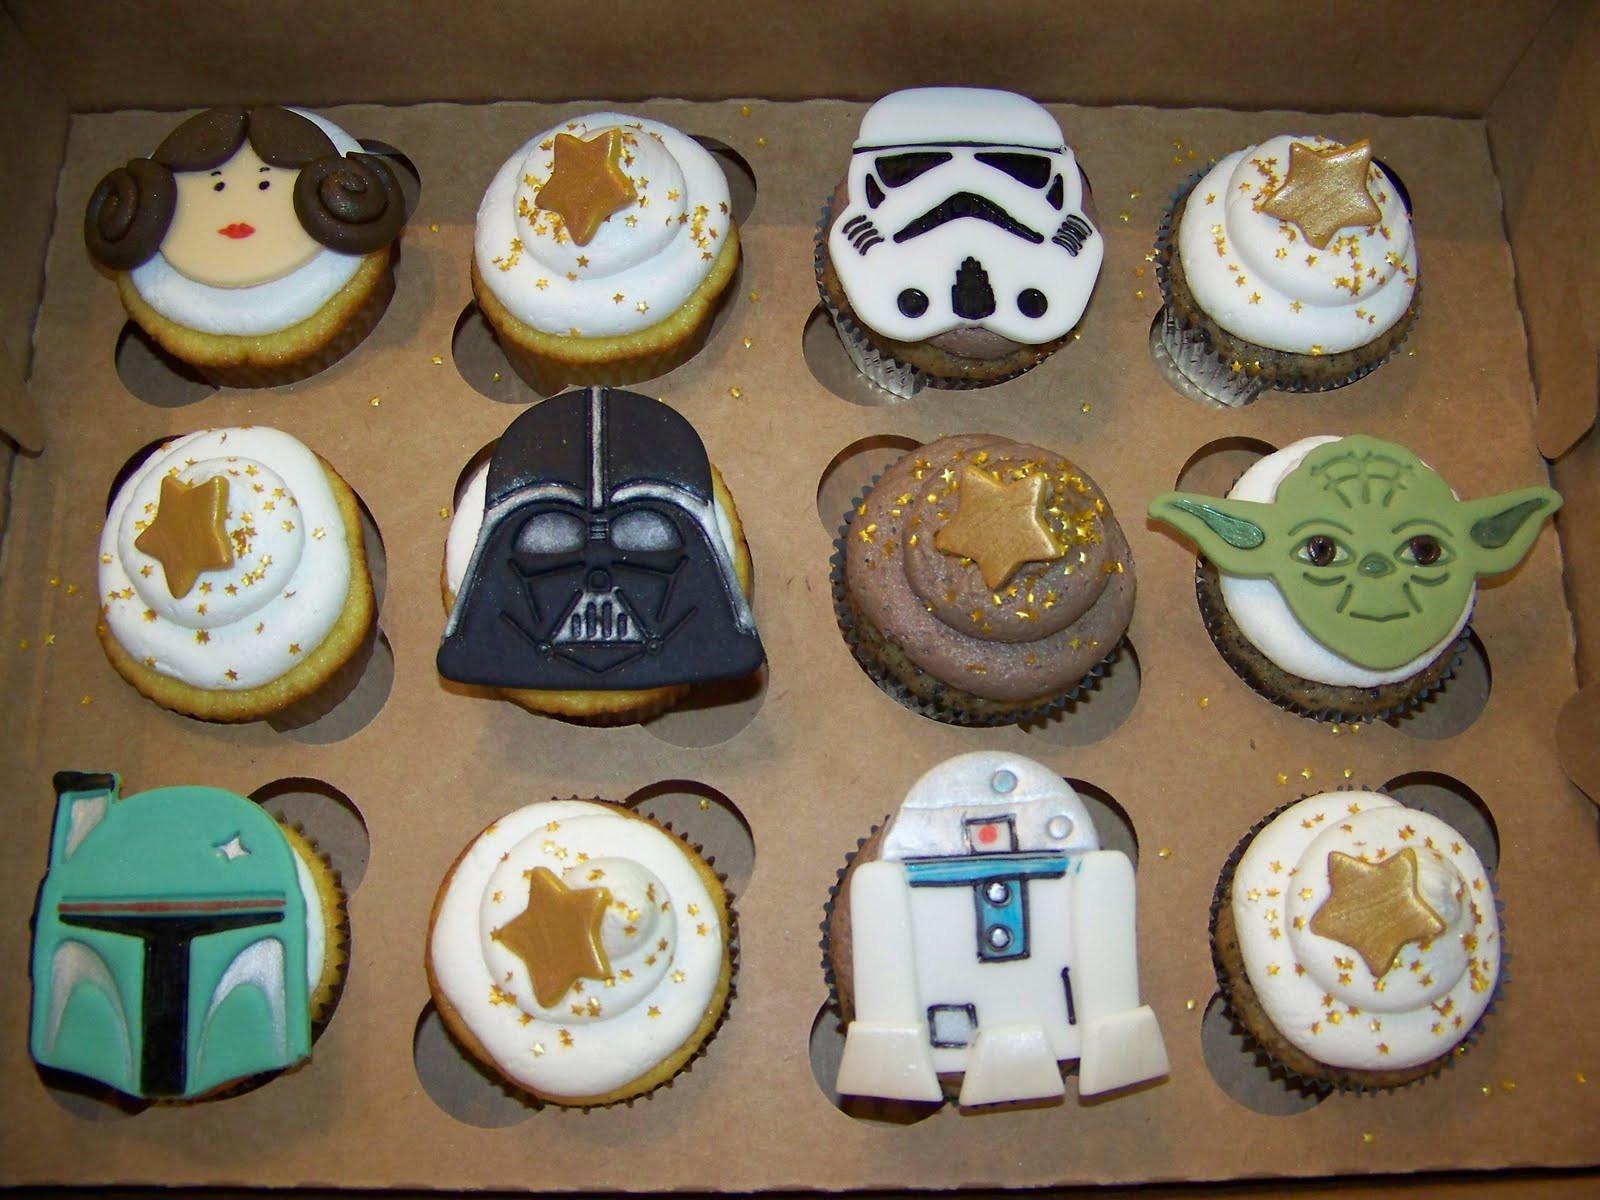 Star Wars Cupcakes  Plumeria Cake Studio Star Wars Cupcakes